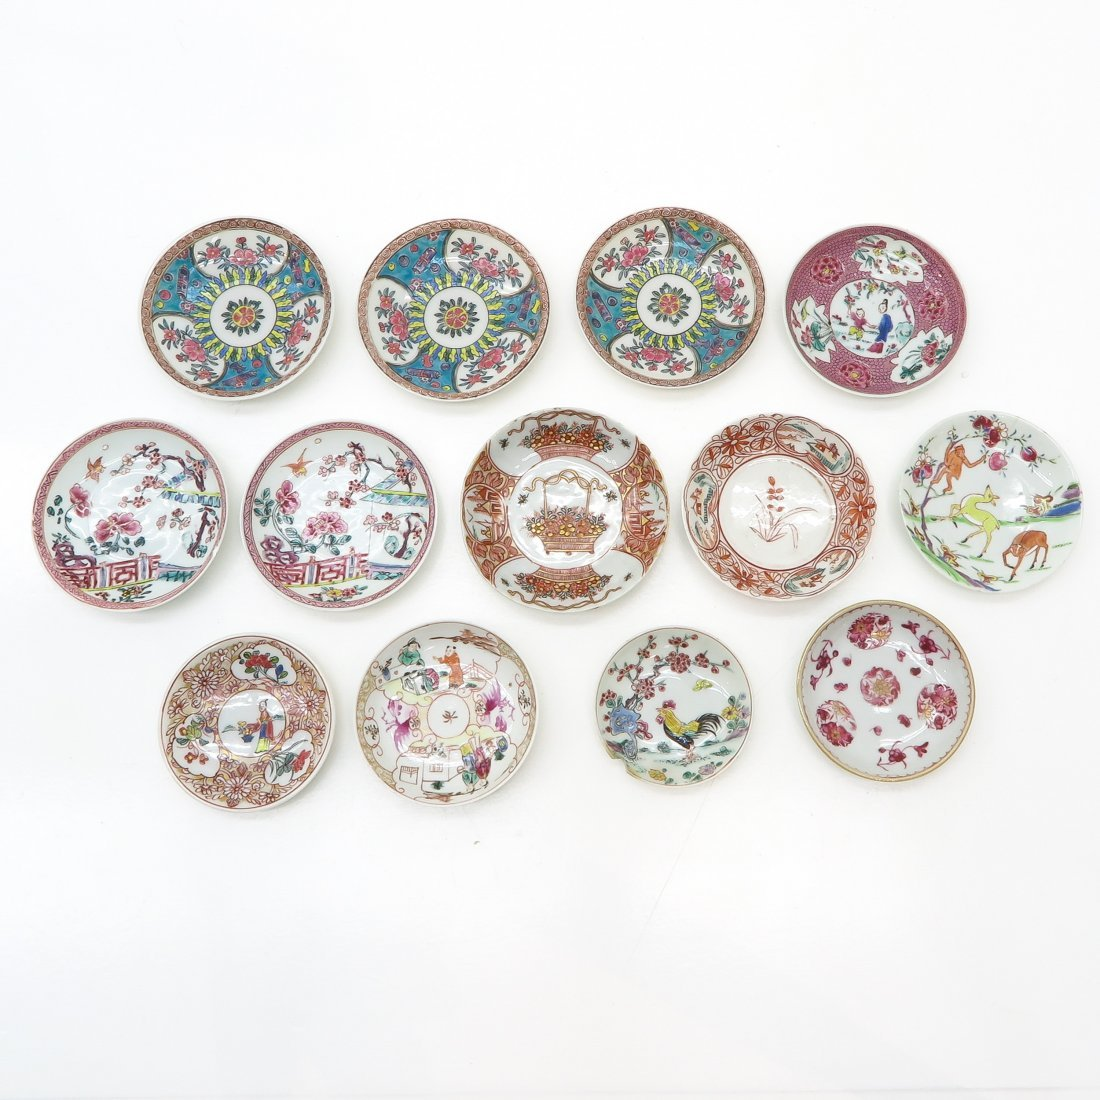 Diverse Lot of China Porcelain Saucers